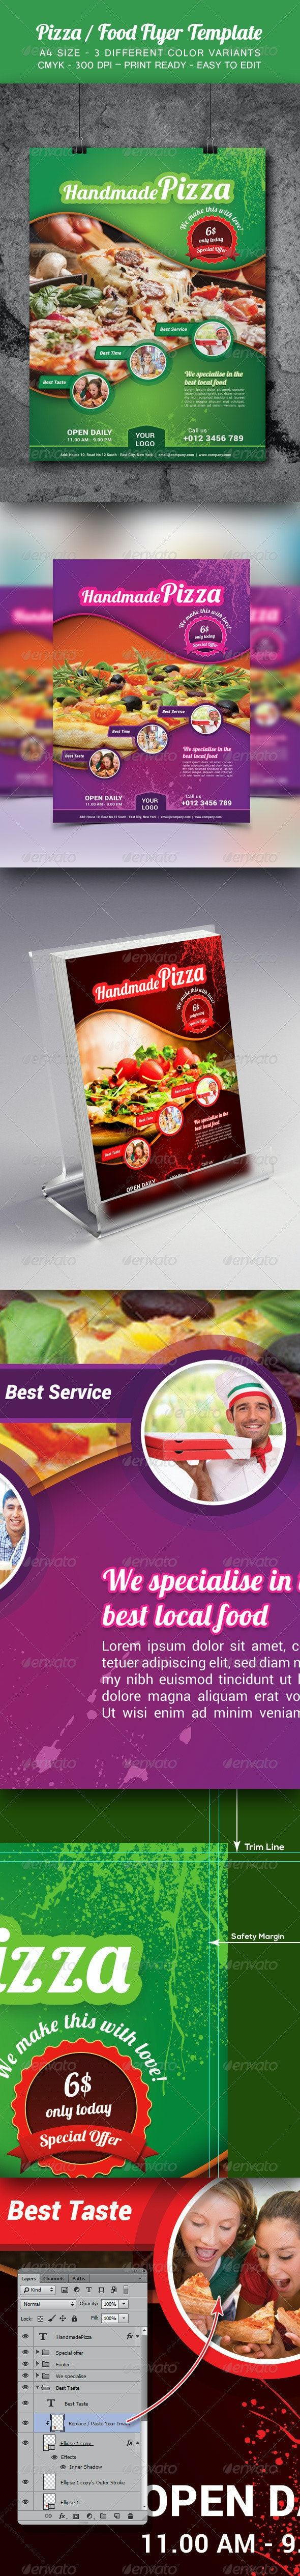 Pizza / Food Flyer Template - Restaurant Flyers